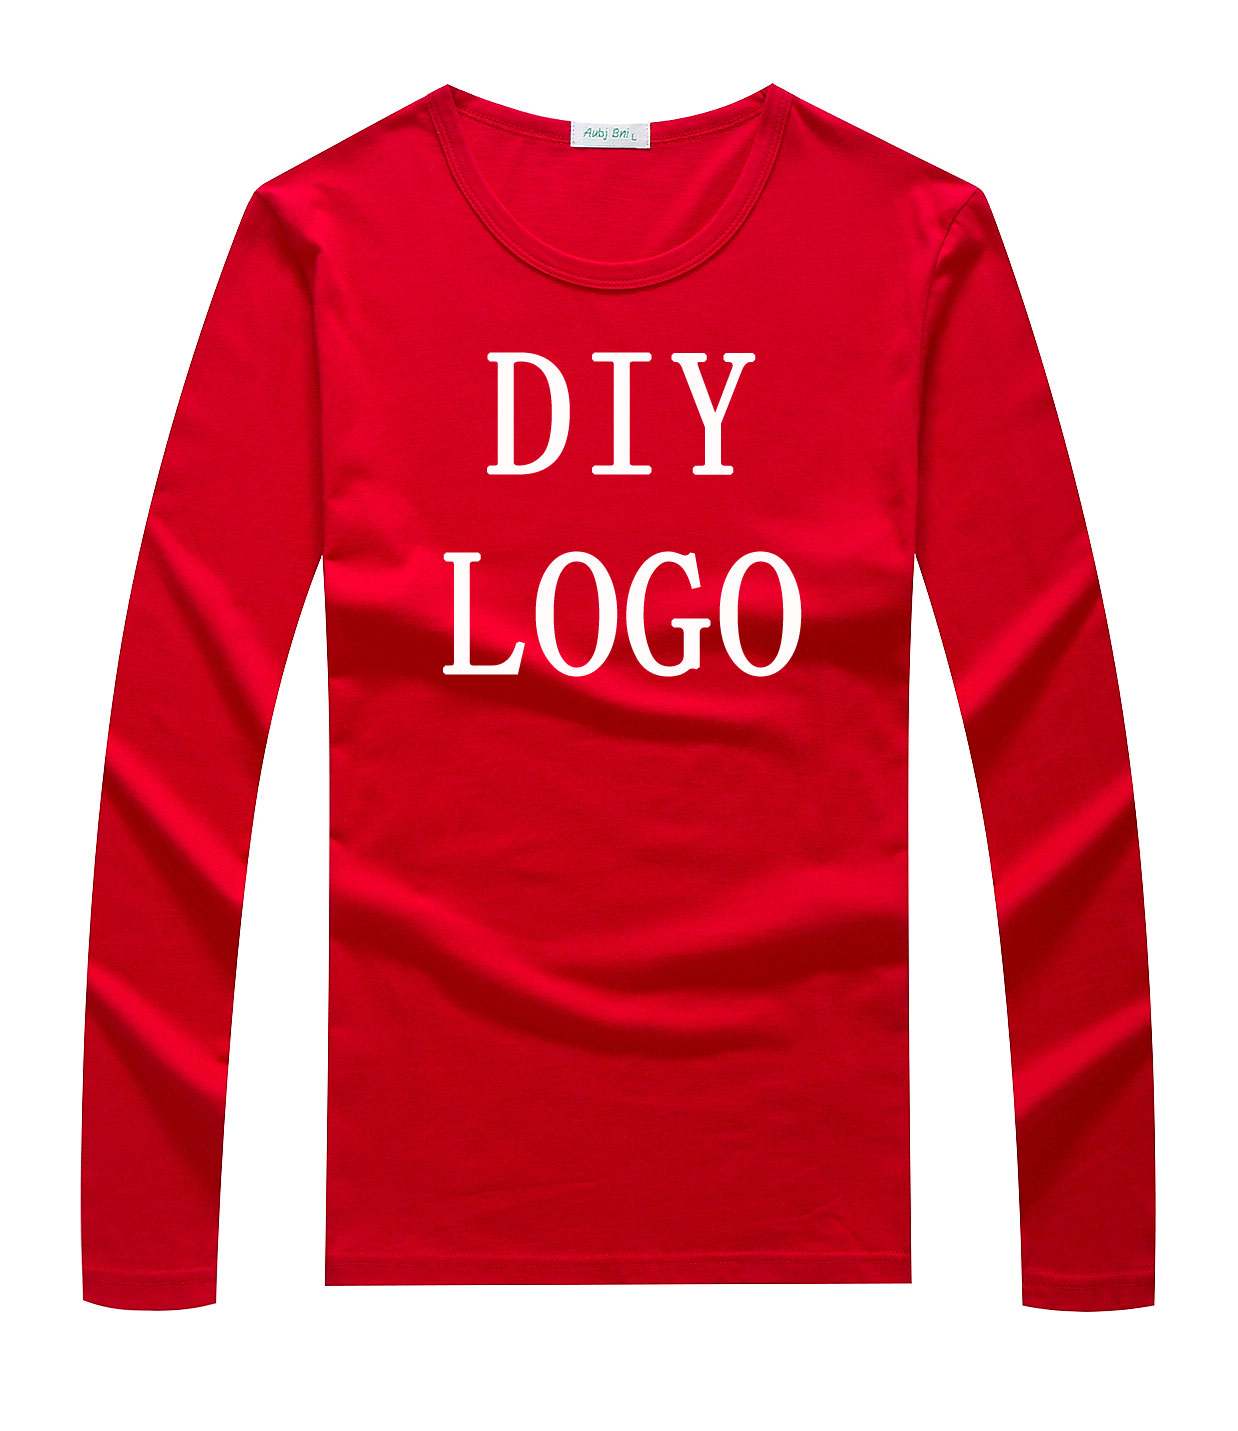 Design your own t shirt las vegas - Custom Logo Long Sleeve Shirt Plain Logo Diy Tshirt Customized Pattern Print Embroidery Design Your Owner T Shirt Top Tee Shirts